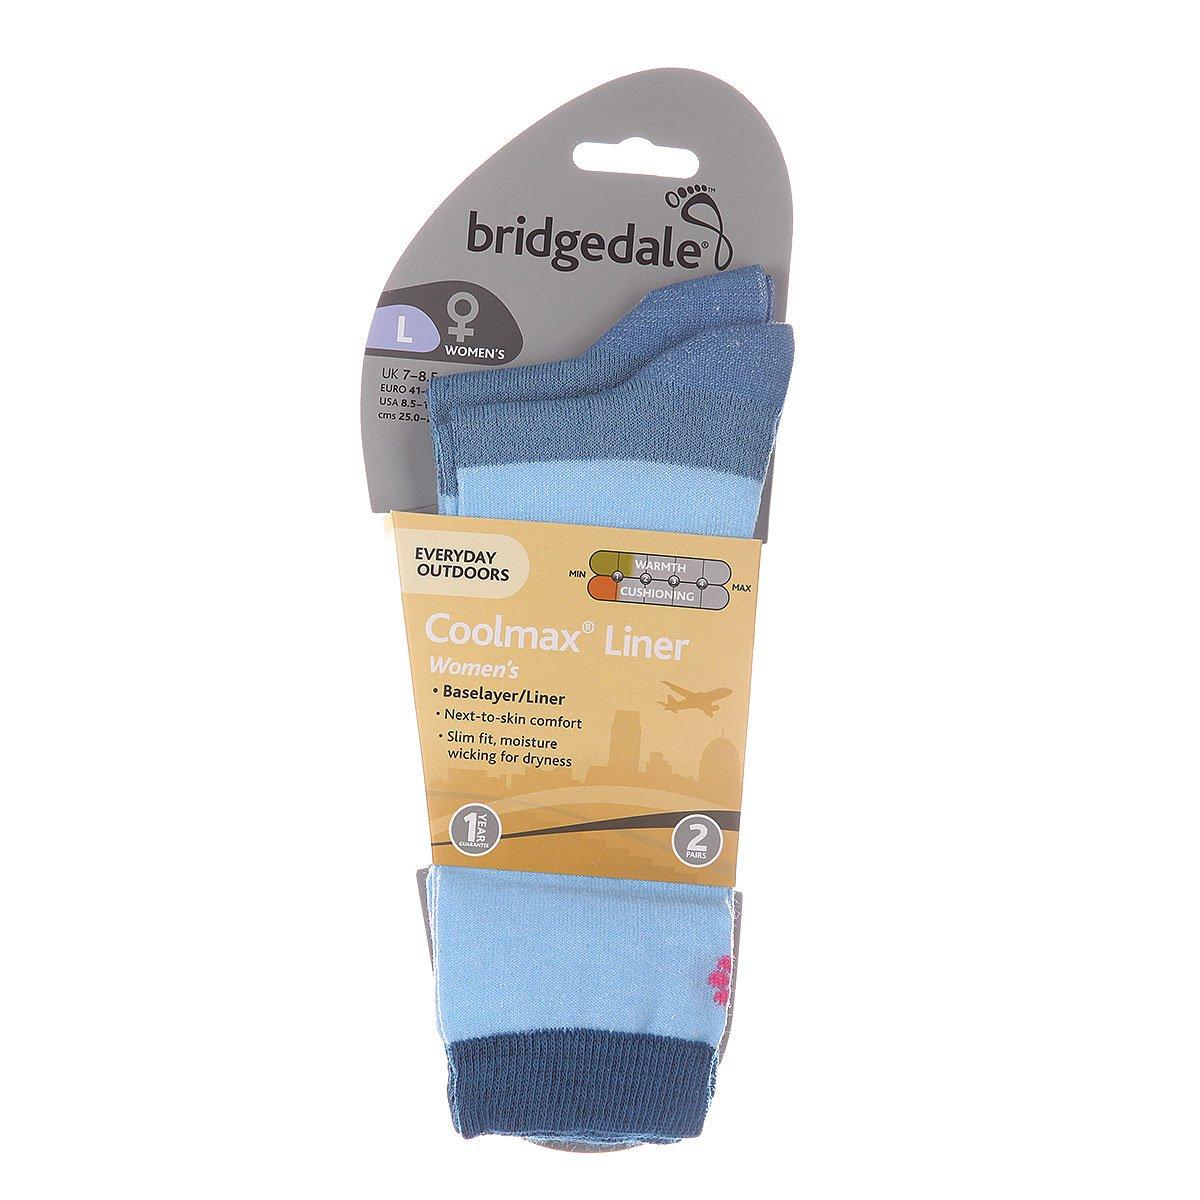 Носки средние женские Bridgedale Everyday Outdoors Coolmax Liner Ws X 2 Sky